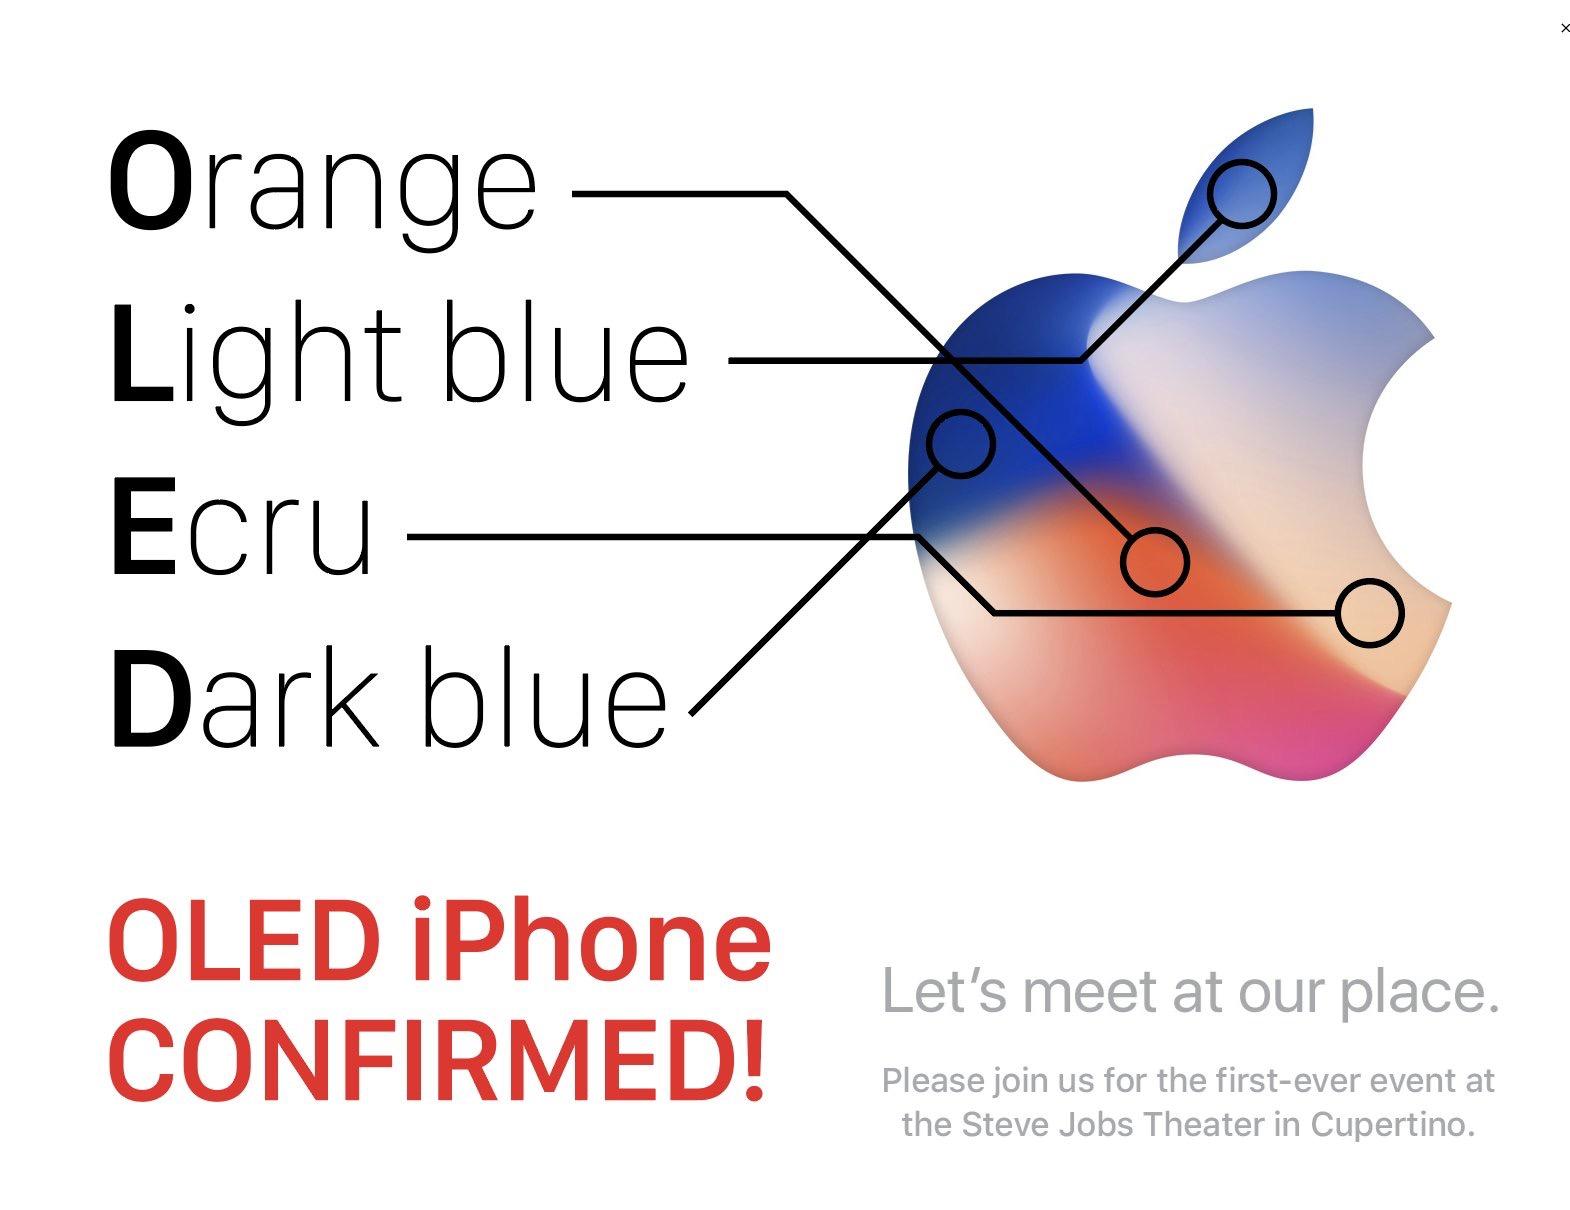 OLED-hint op iPhone 8-uitnodiging.